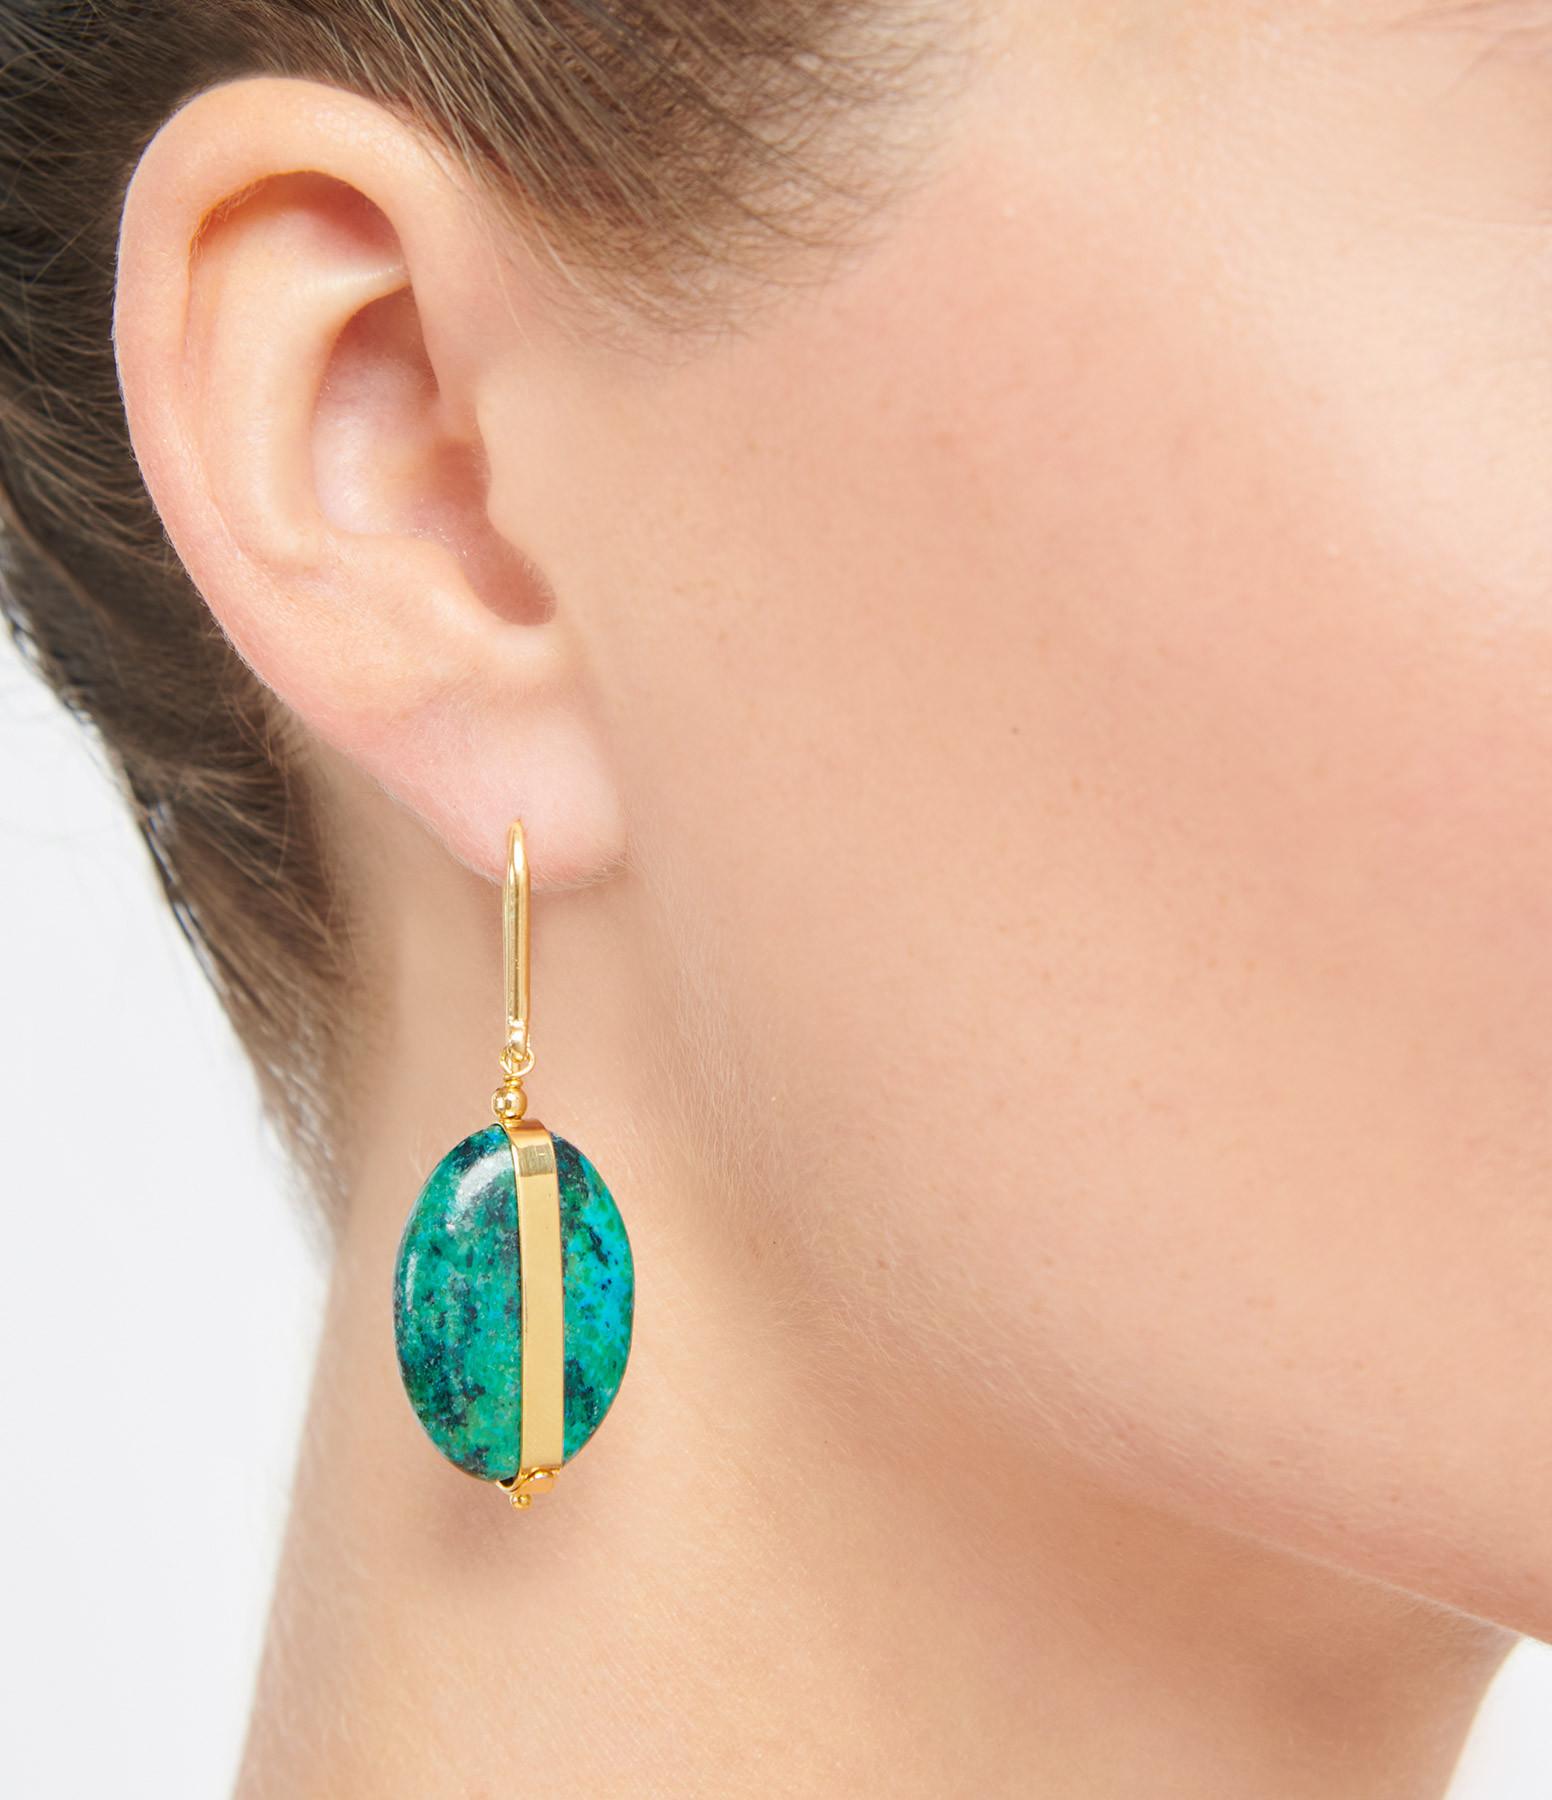 ISABEL MARANT - Boucles d'oreilles Laiton Amazone